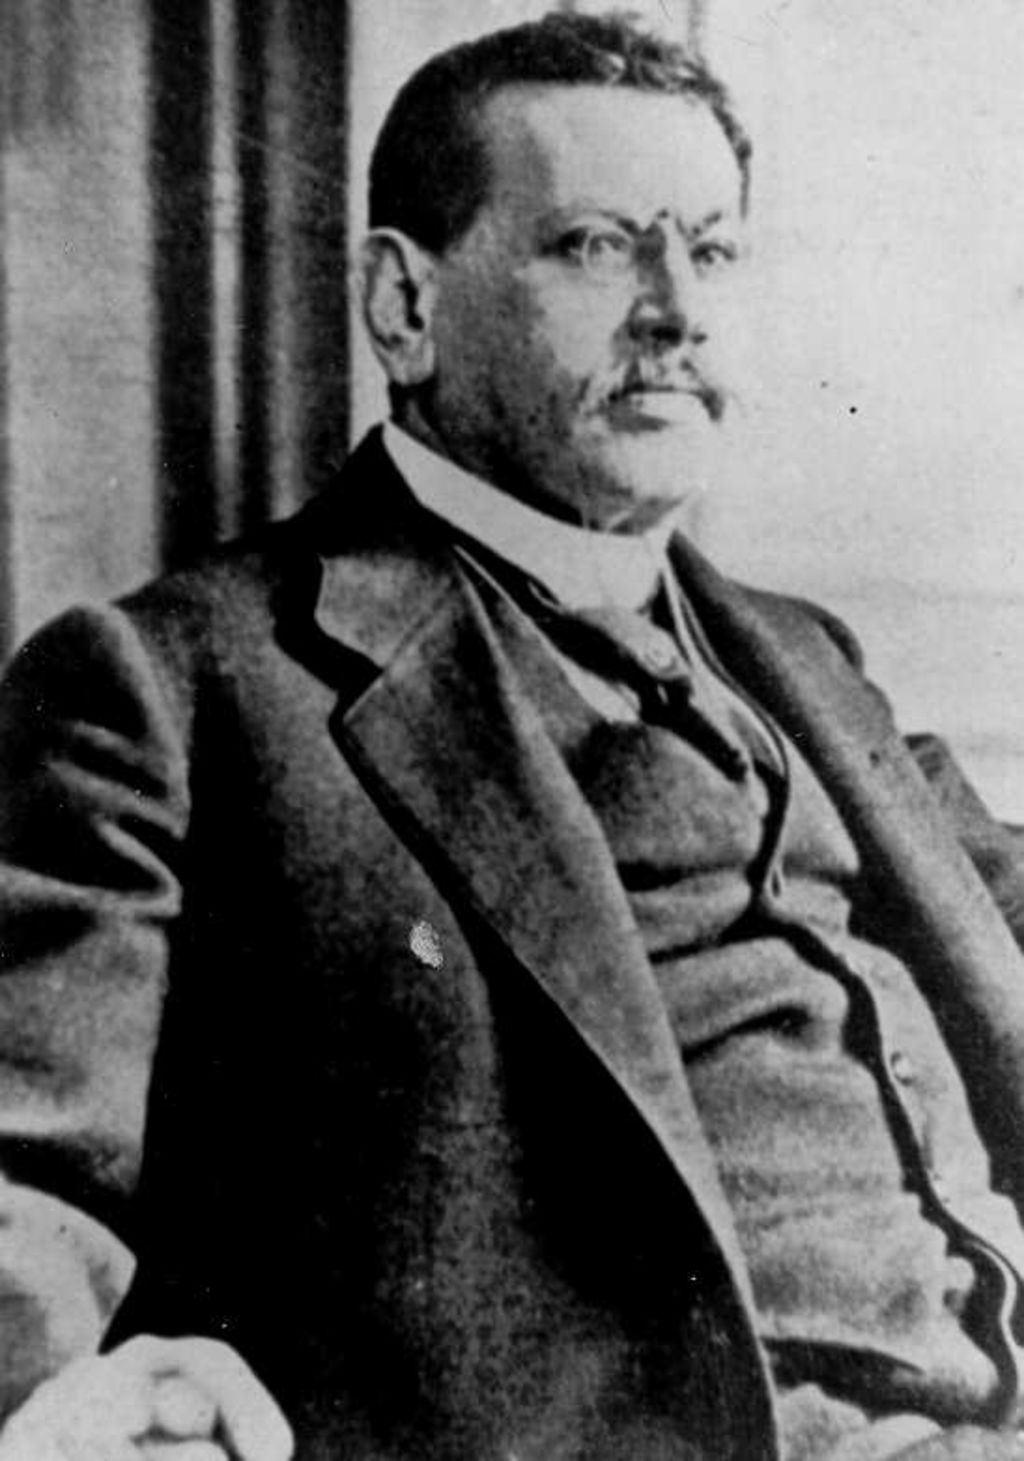 Hugo Preuss